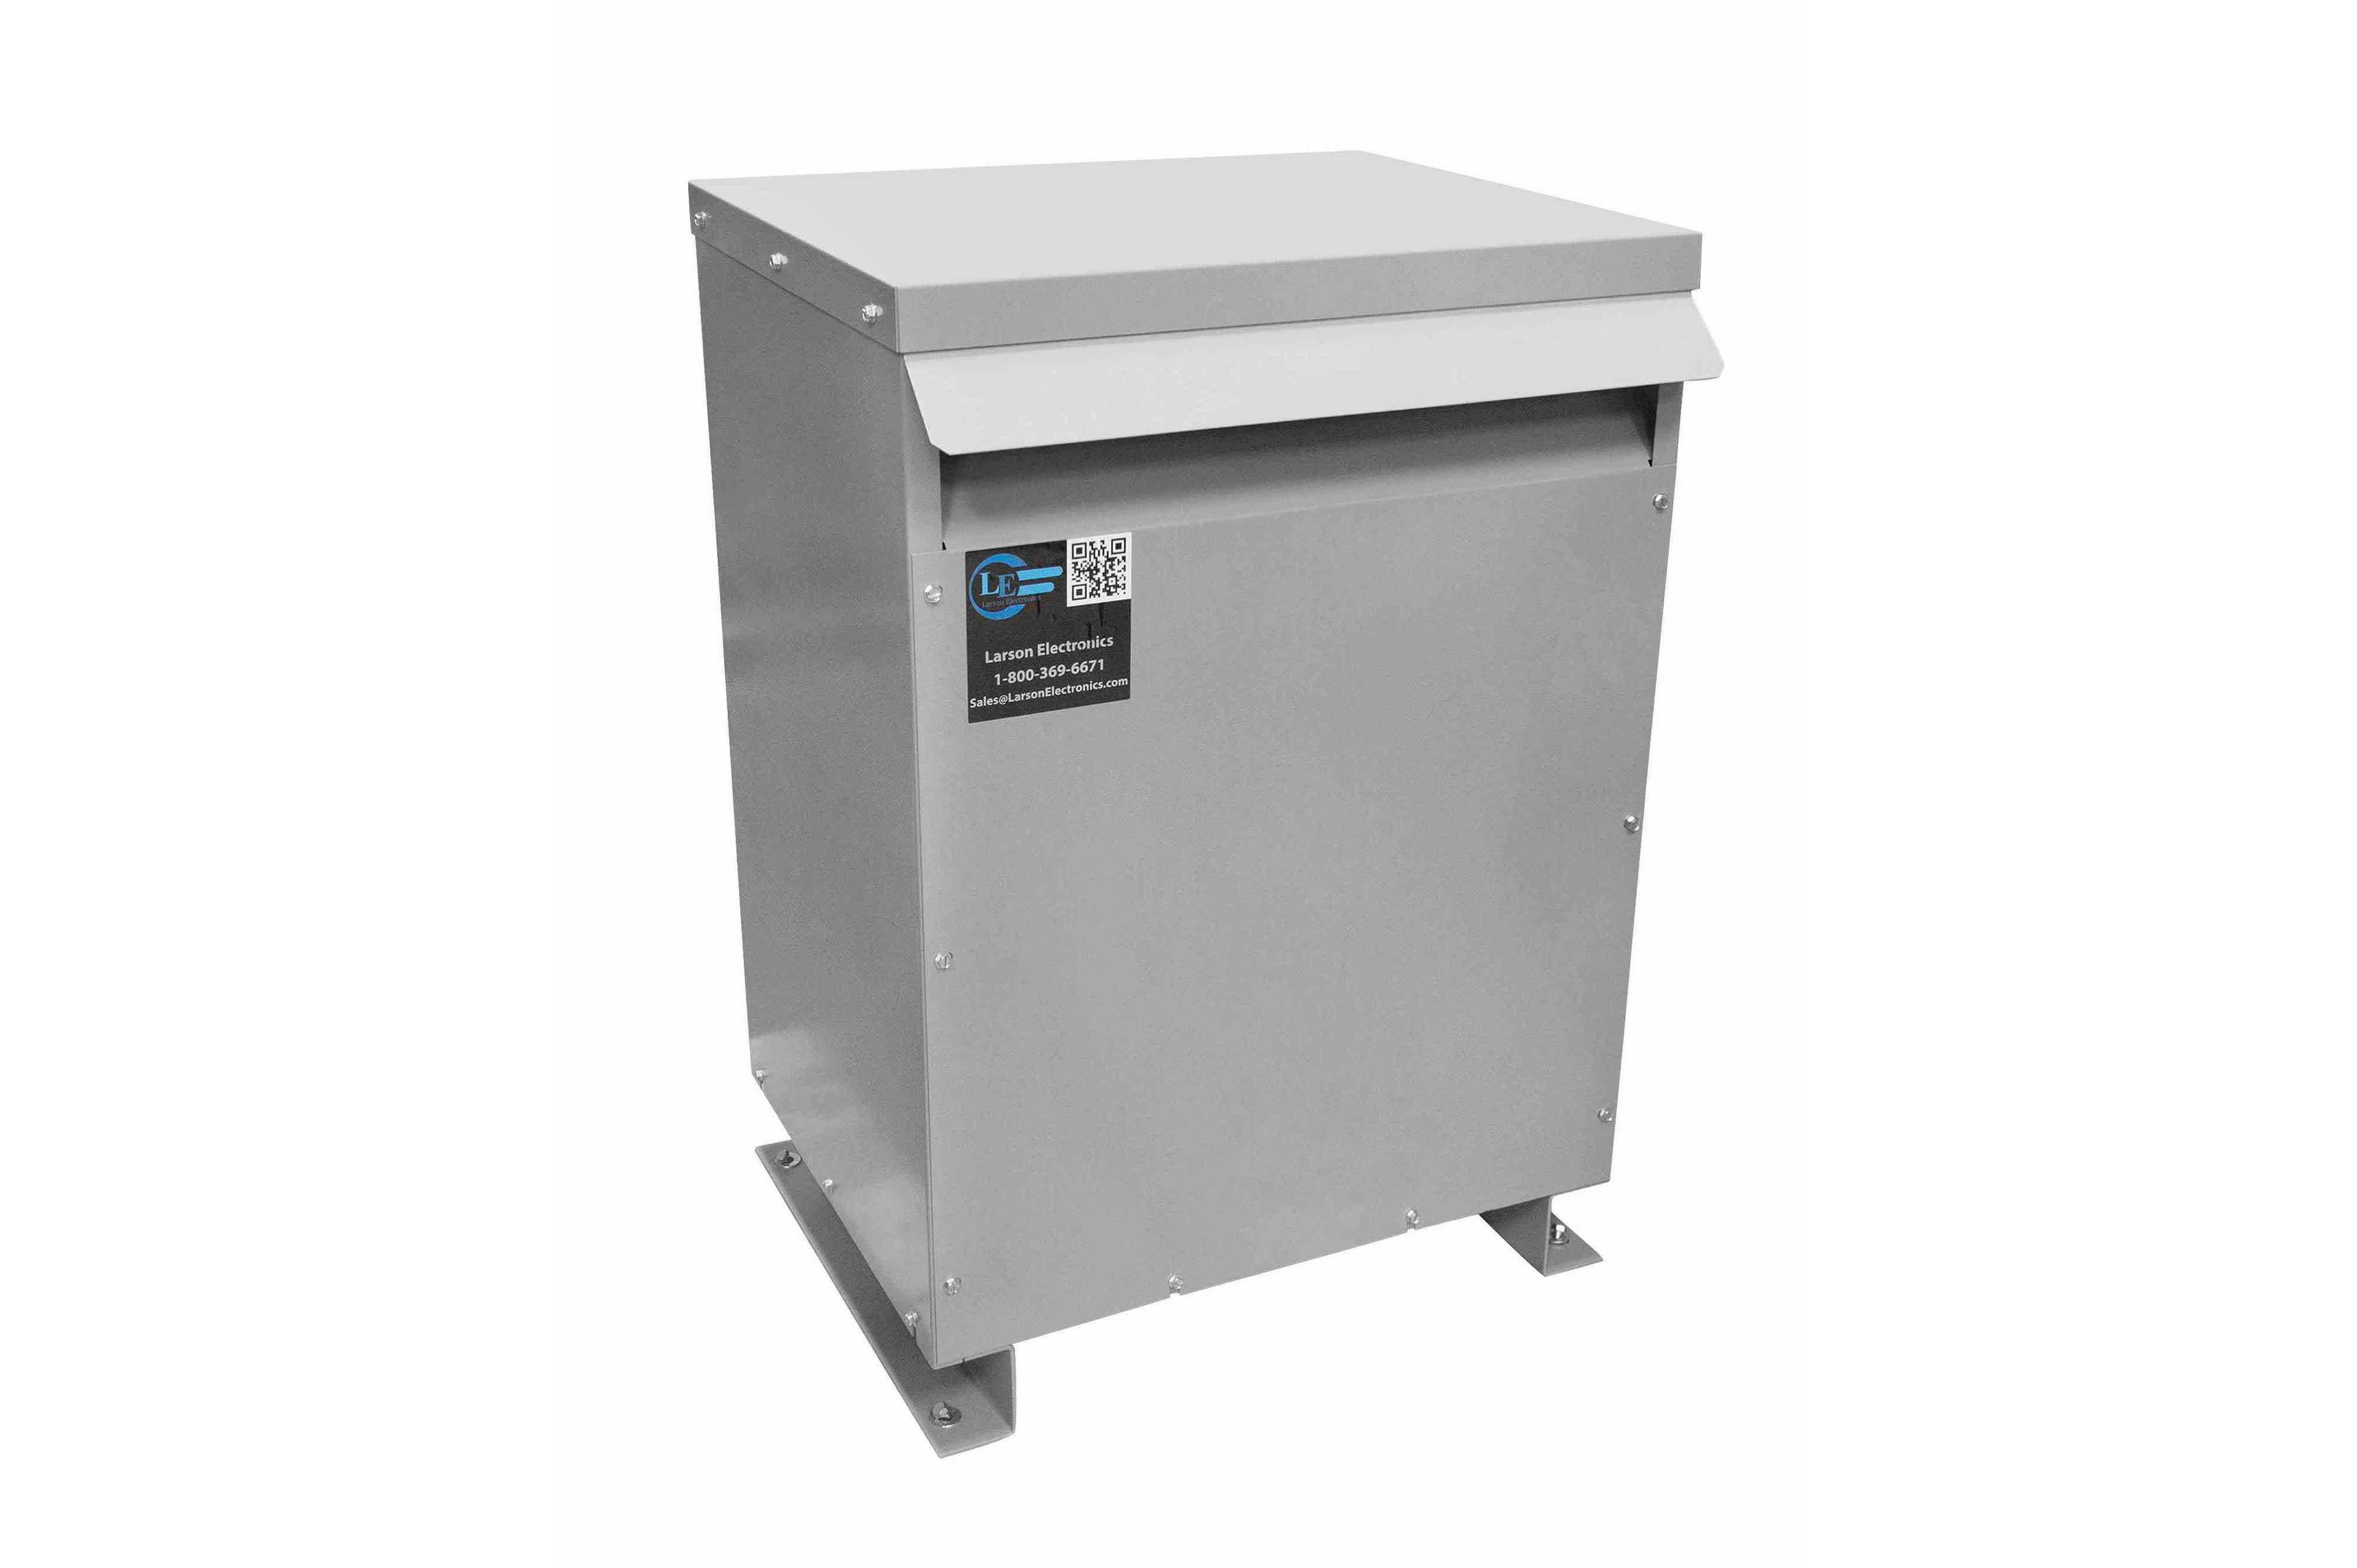 26 kVA 3PH Isolation Transformer, 220V Wye Primary, 480Y/277 Wye-N Secondary, N3R, Ventilated, 60 Hz